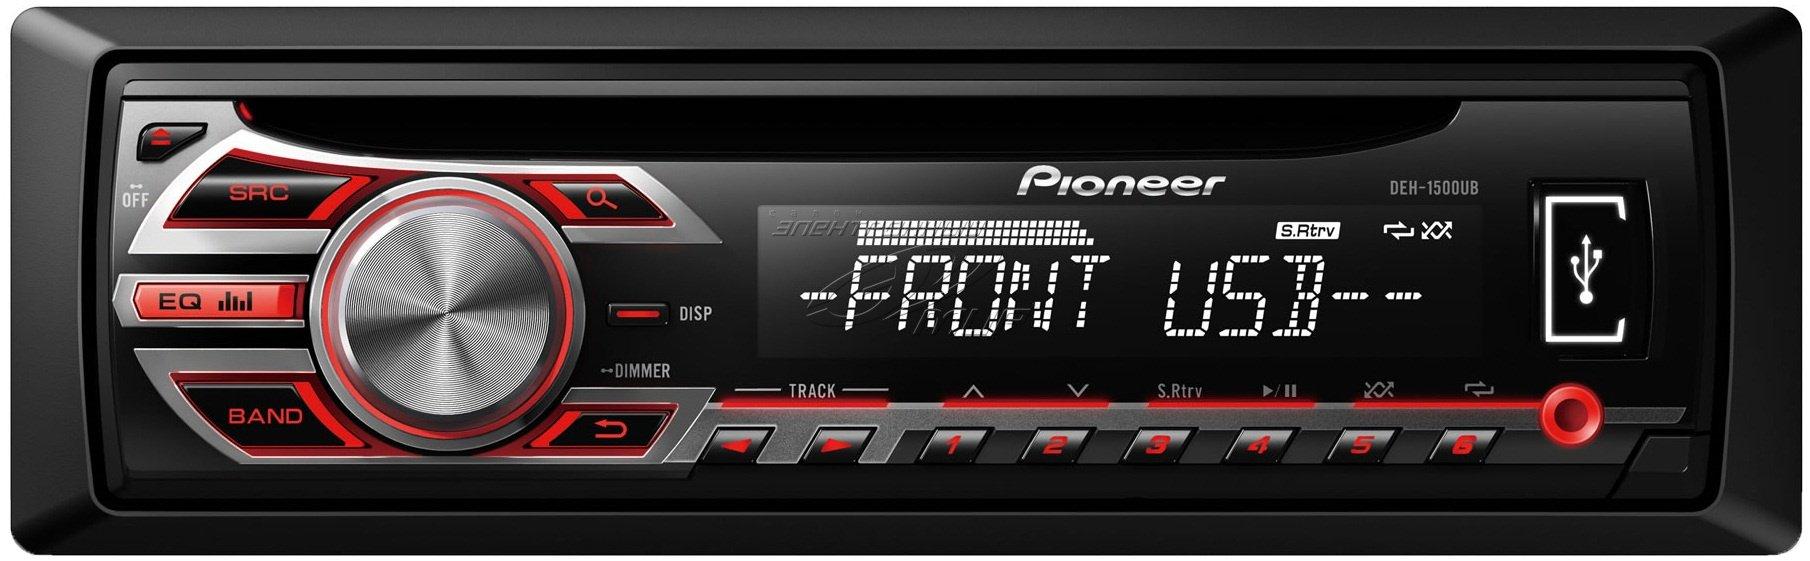 Pioneer 1500 ub схема